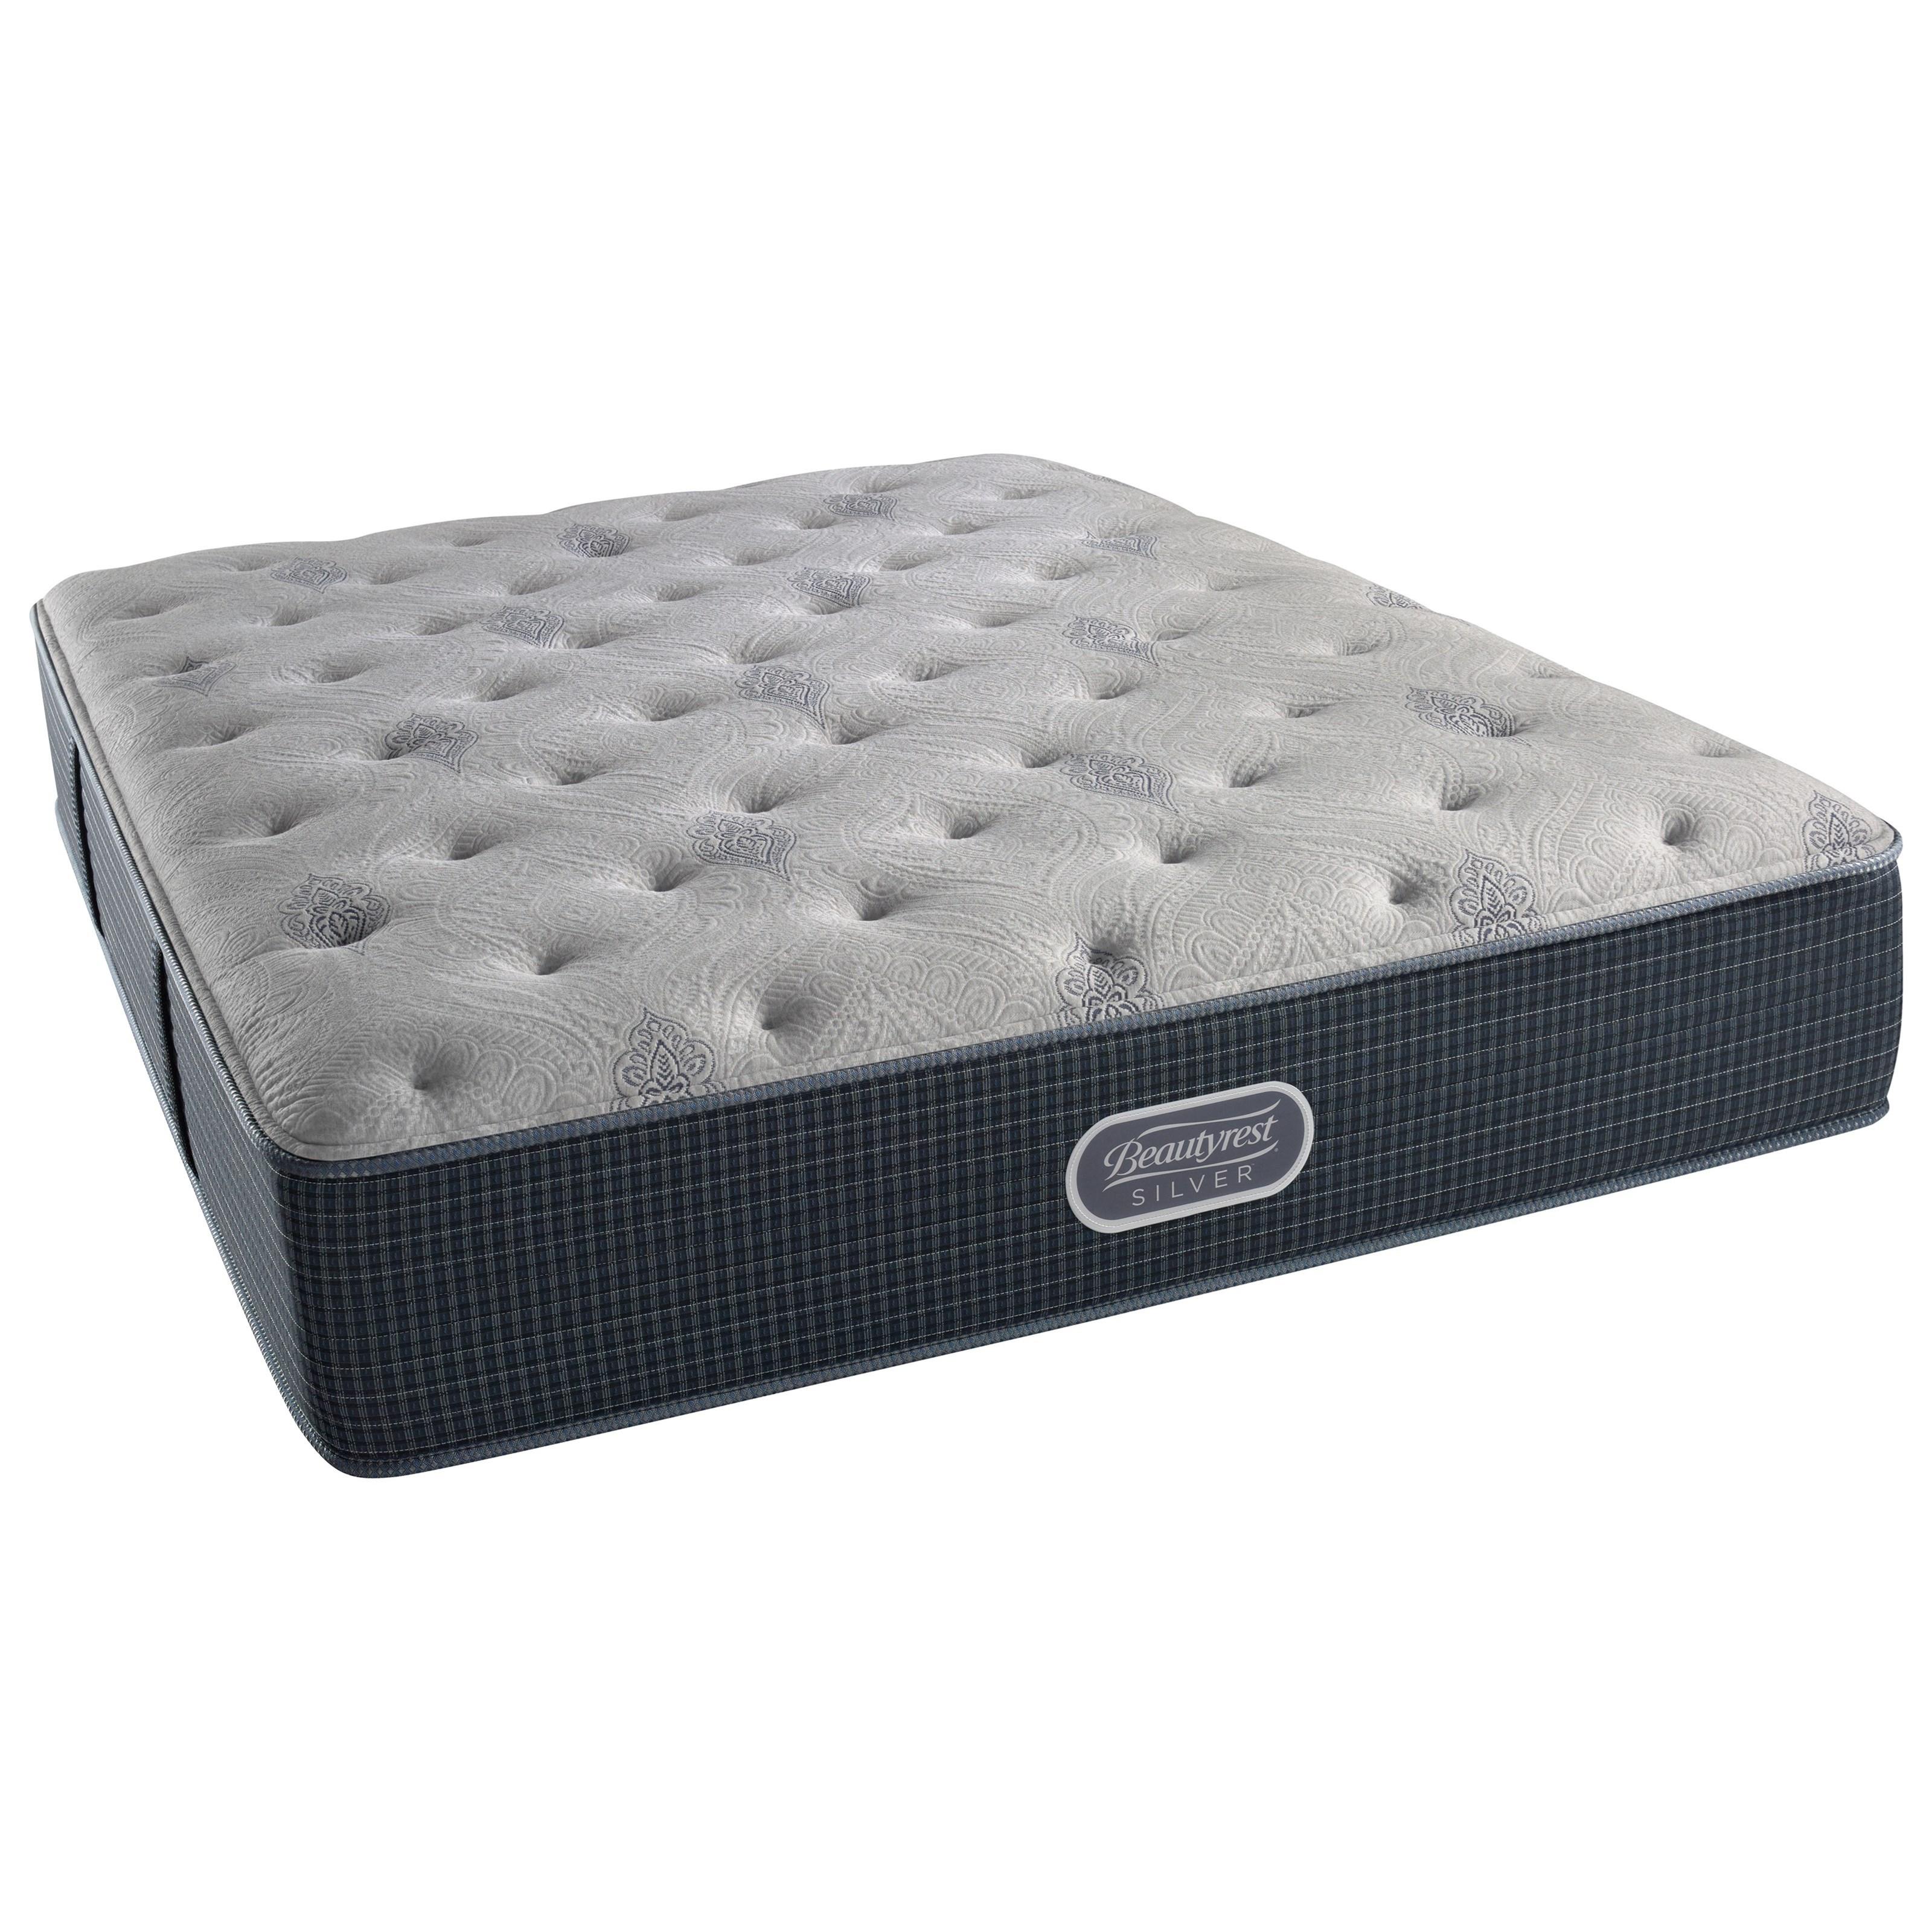 Beautyrest Silver Charcoal Coast Plush Beautyrest Silver Full Mattress - Item Number: 700600248-1030